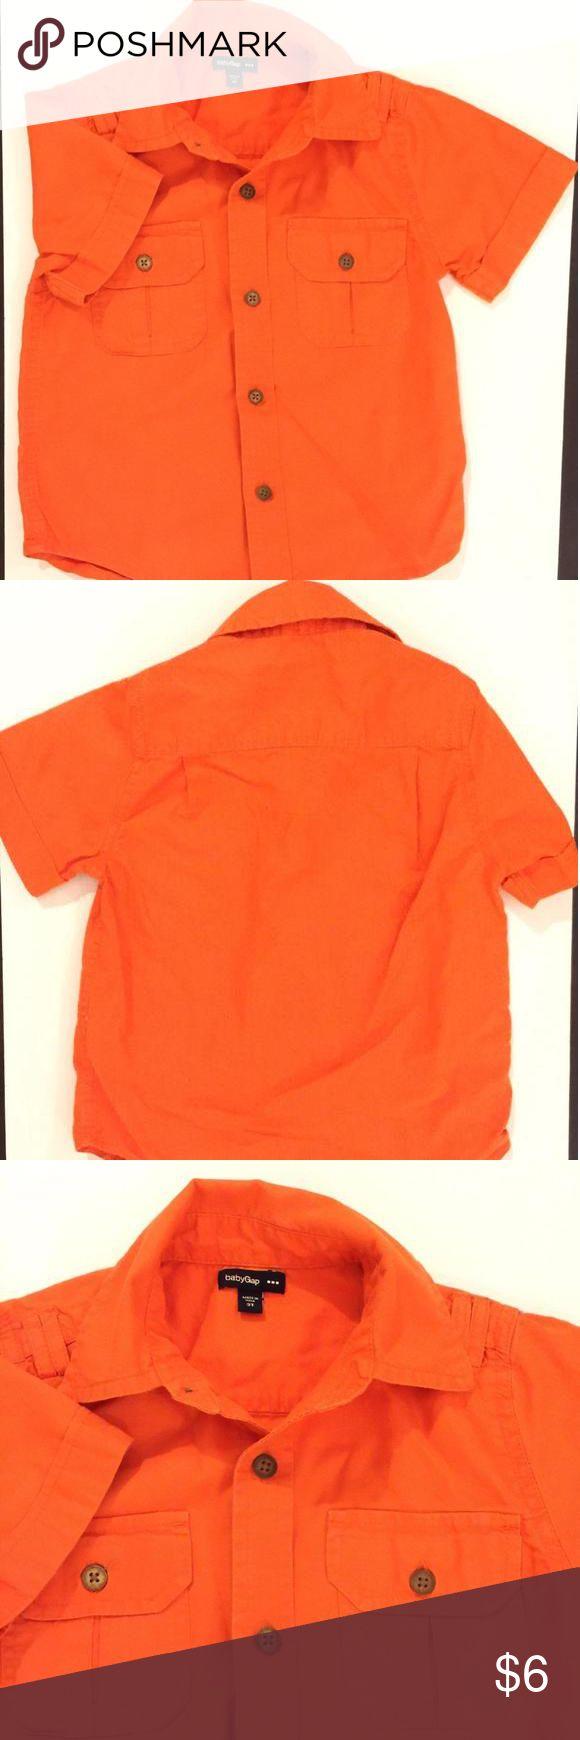 🎉Editors Pick🎉Gap short sleeve dress shirt size 3t Very light button up shirt sleeve shirt Baby Gap Shirts & Tops